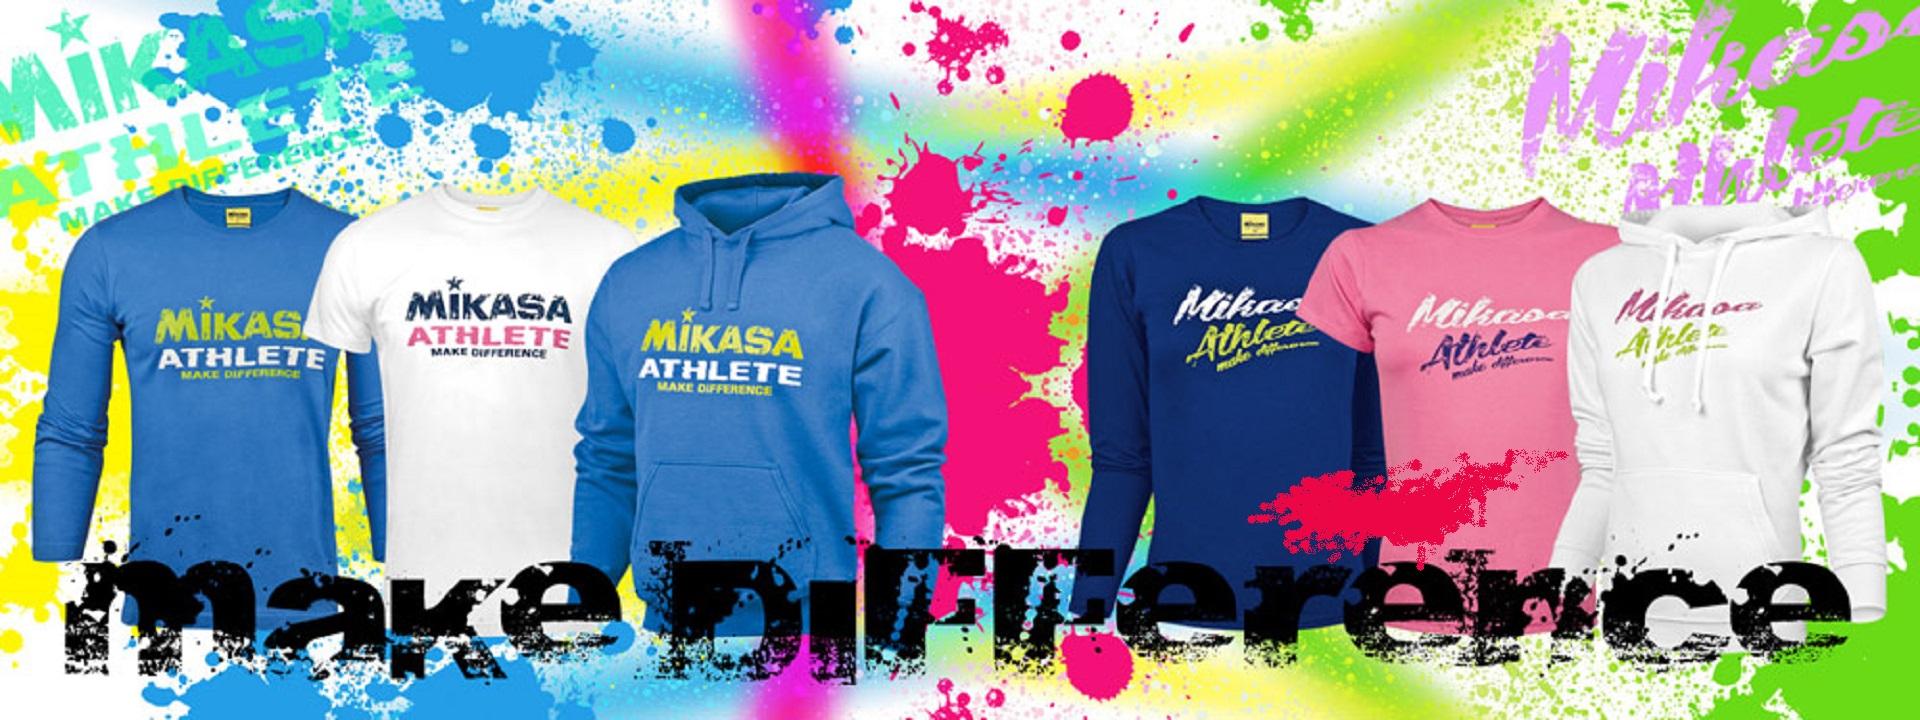 free-time-szabadido-ruhazat-mikasa-olasz-sportruhazat-pulover.jpg